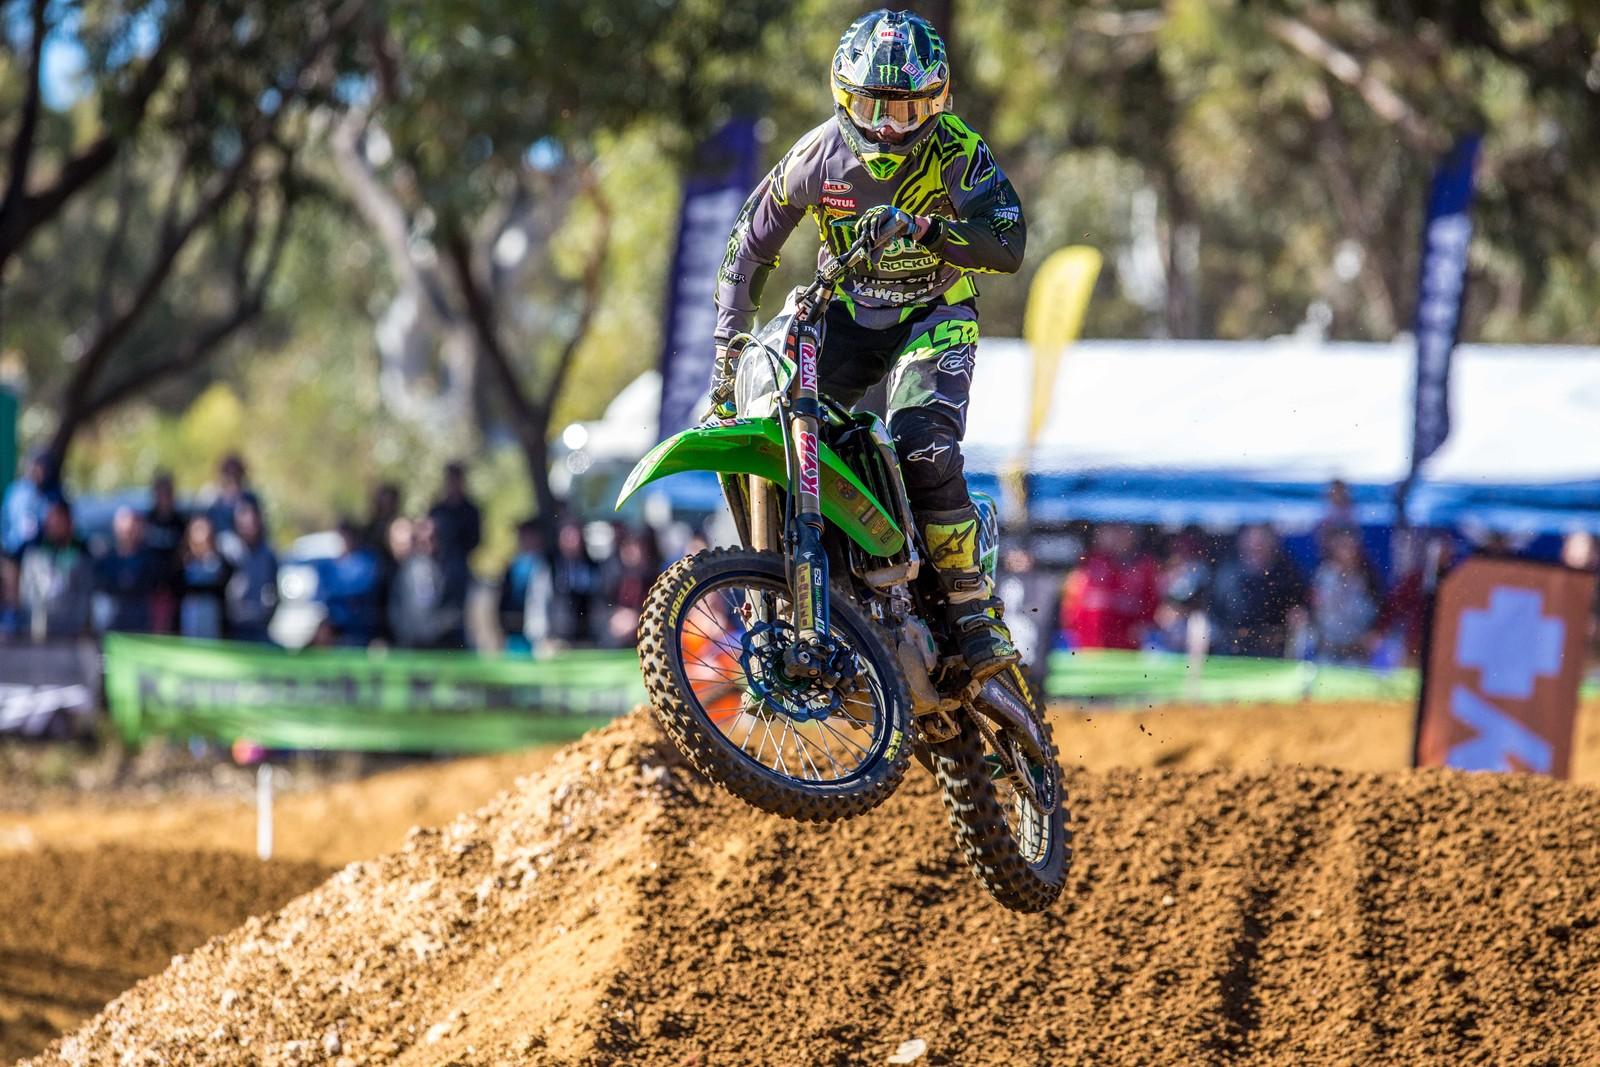 Matt Moss - Australian Motul MX Championships: Round 6, Nowra - Motocross Pictures - Vital MX